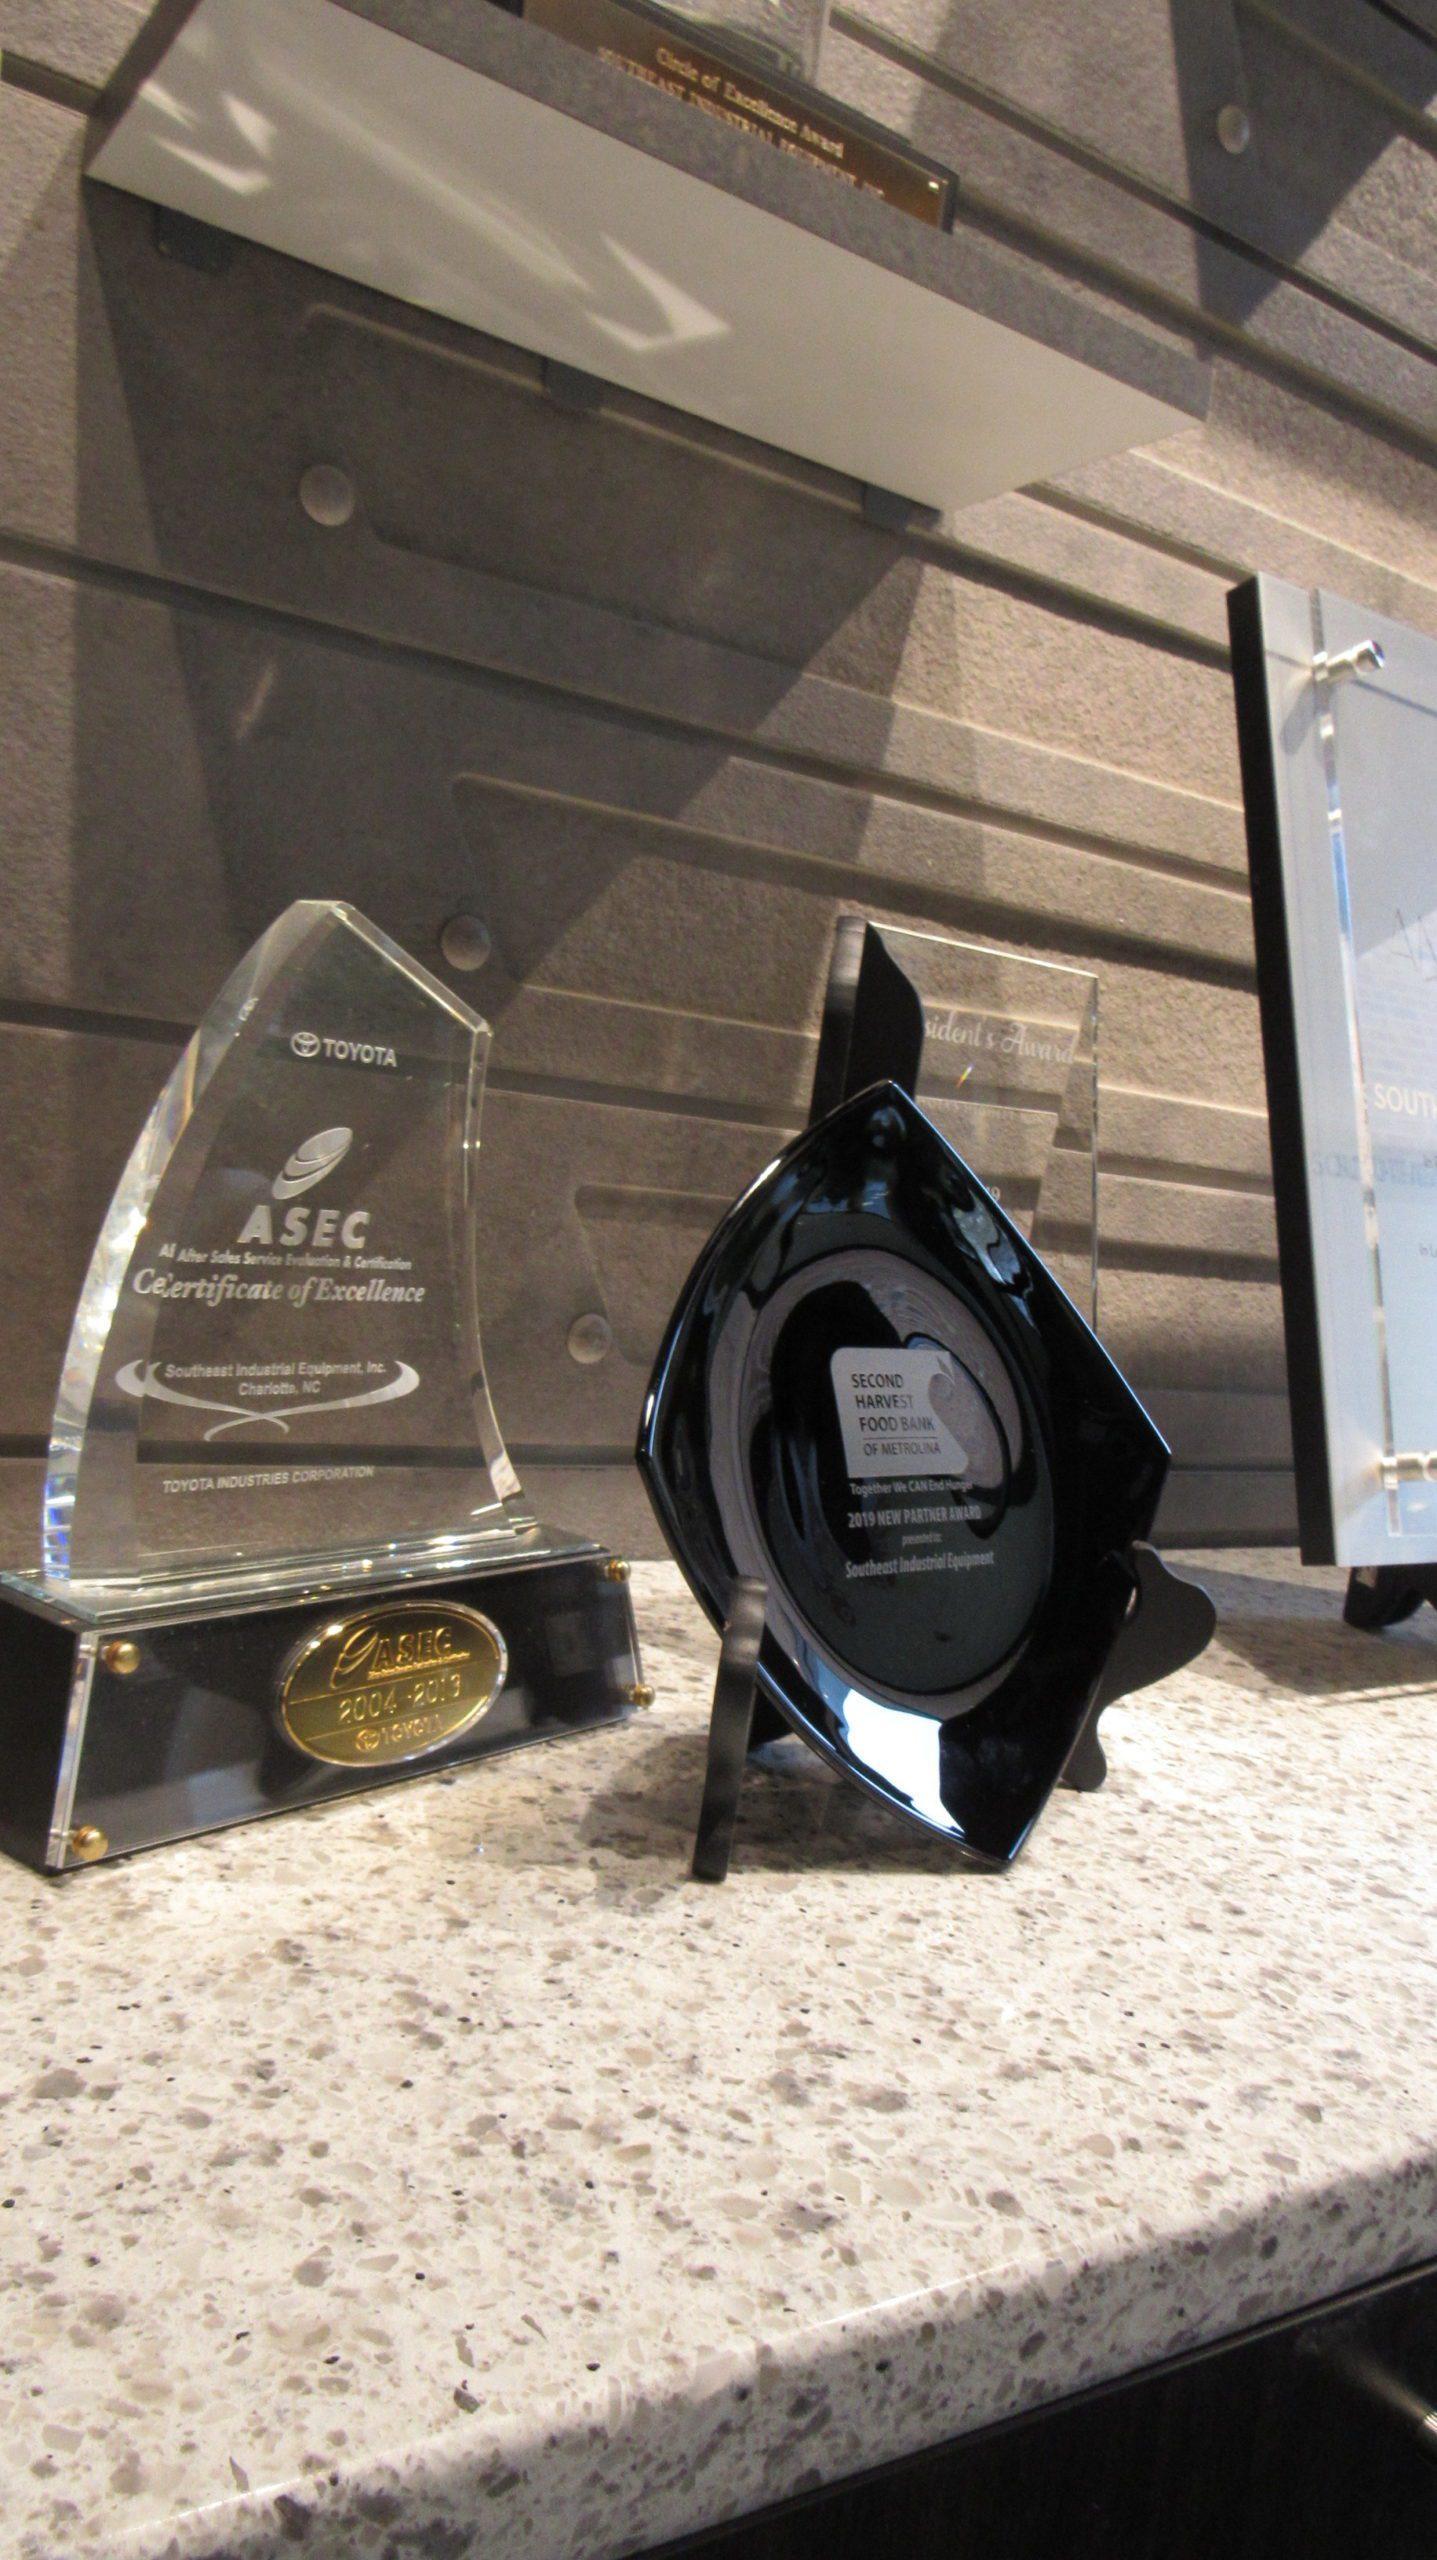 Southeast Industrial Equipment wins Second Harvest Food Bank Partner Award